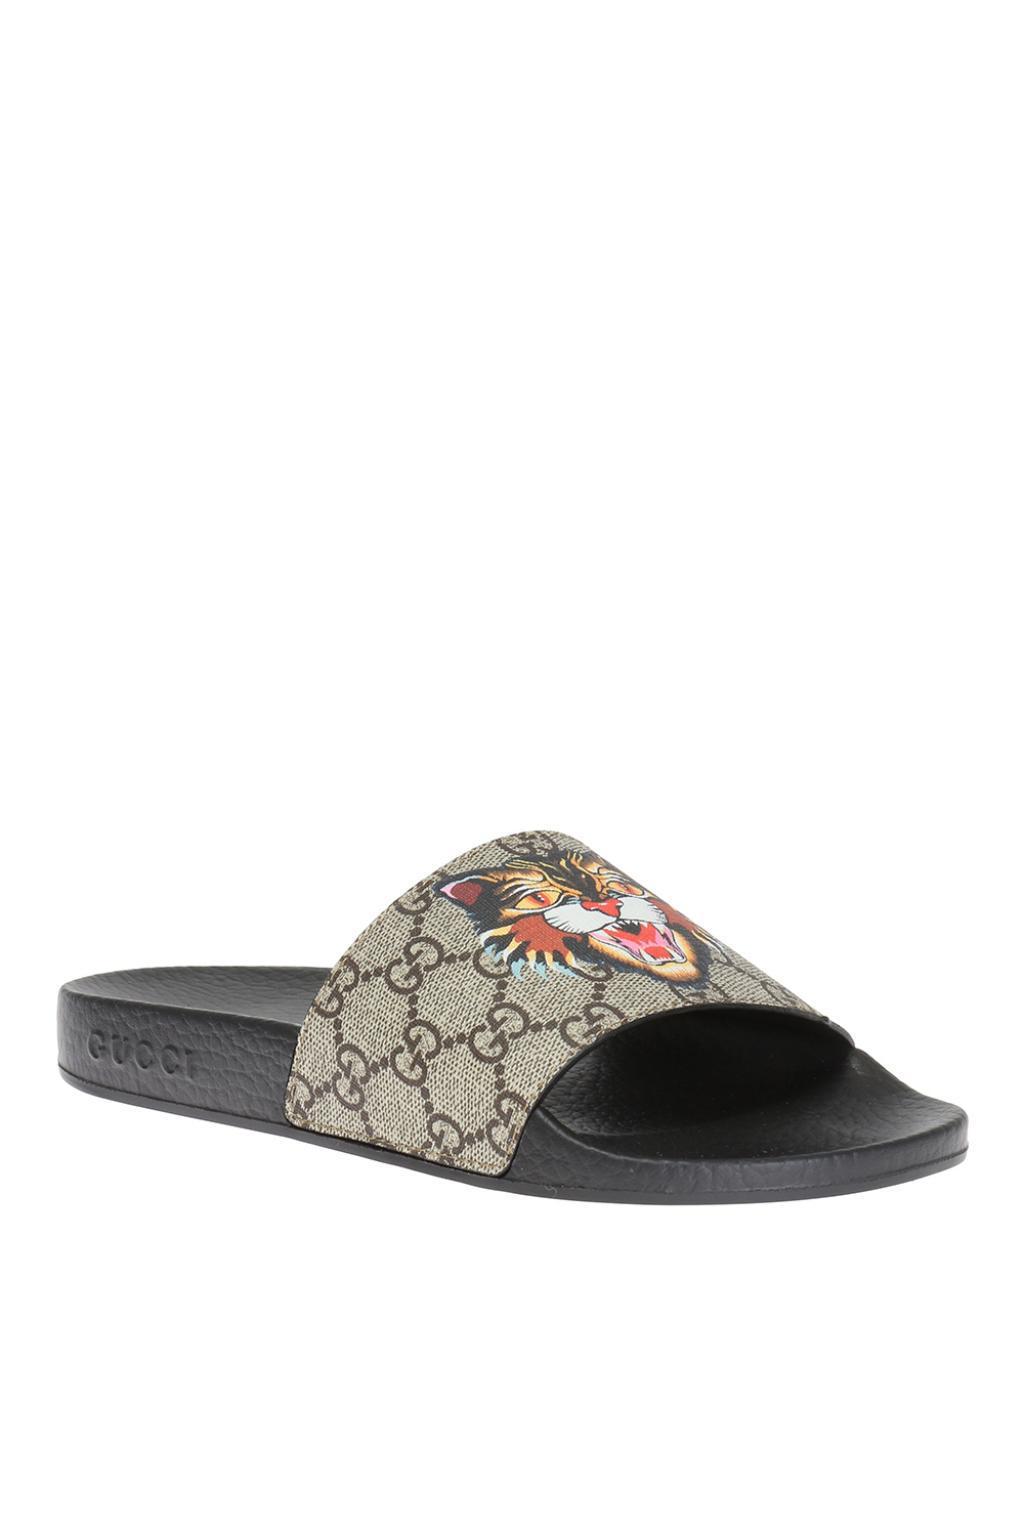 Gucci Tiger Head Slides - Lyst 4e6339cc3c01